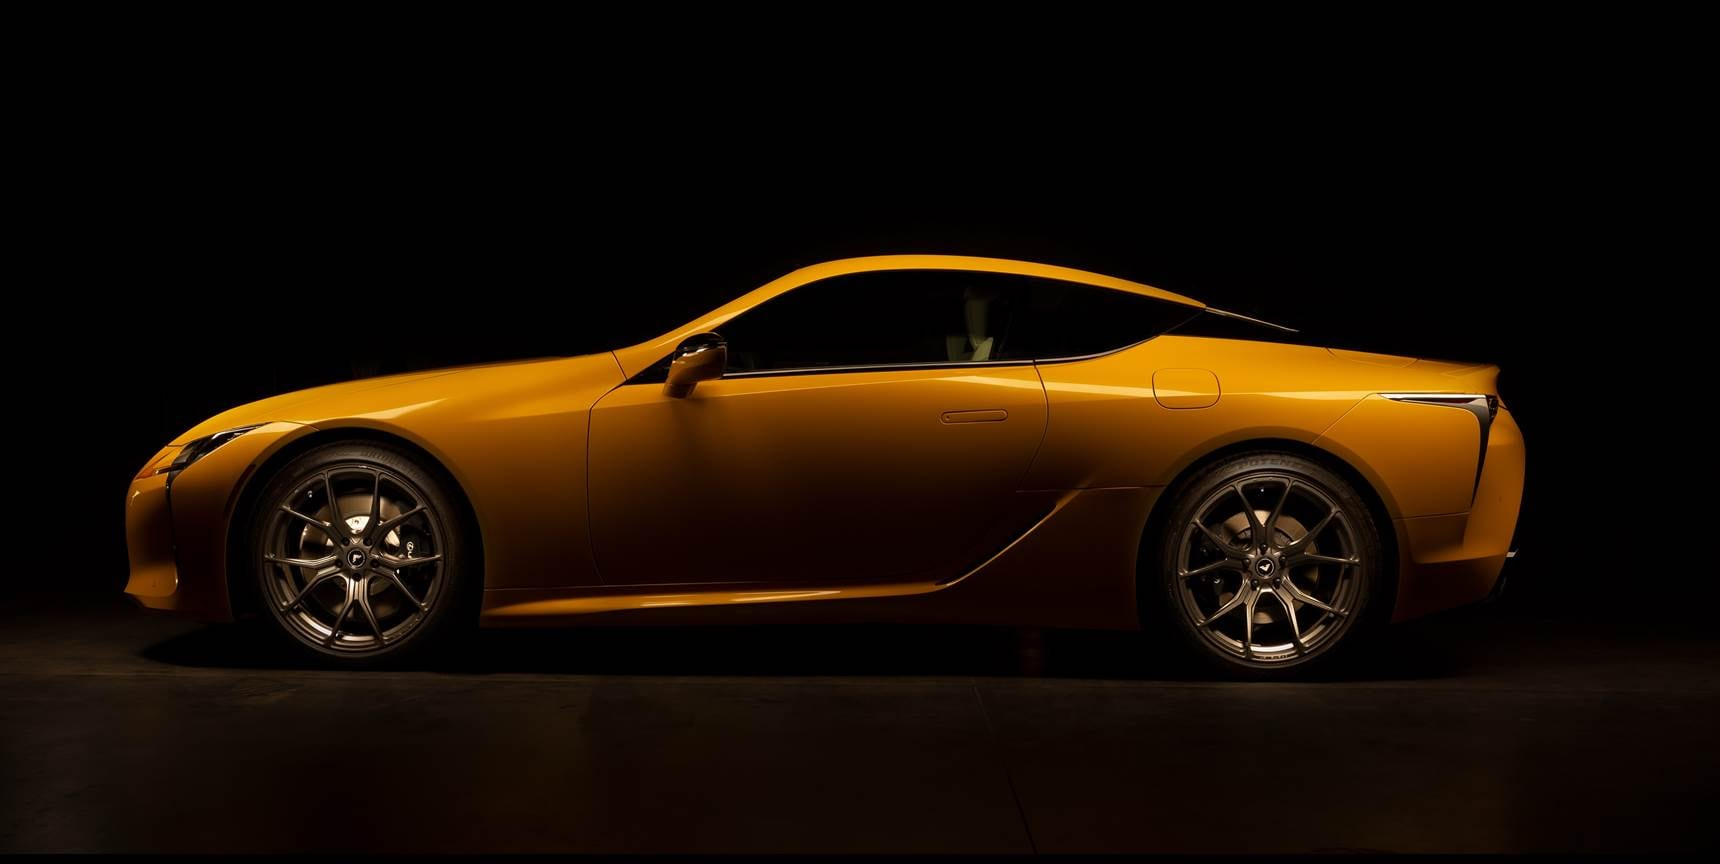 2019 Lexus LC500 Inspiration Series Exterior